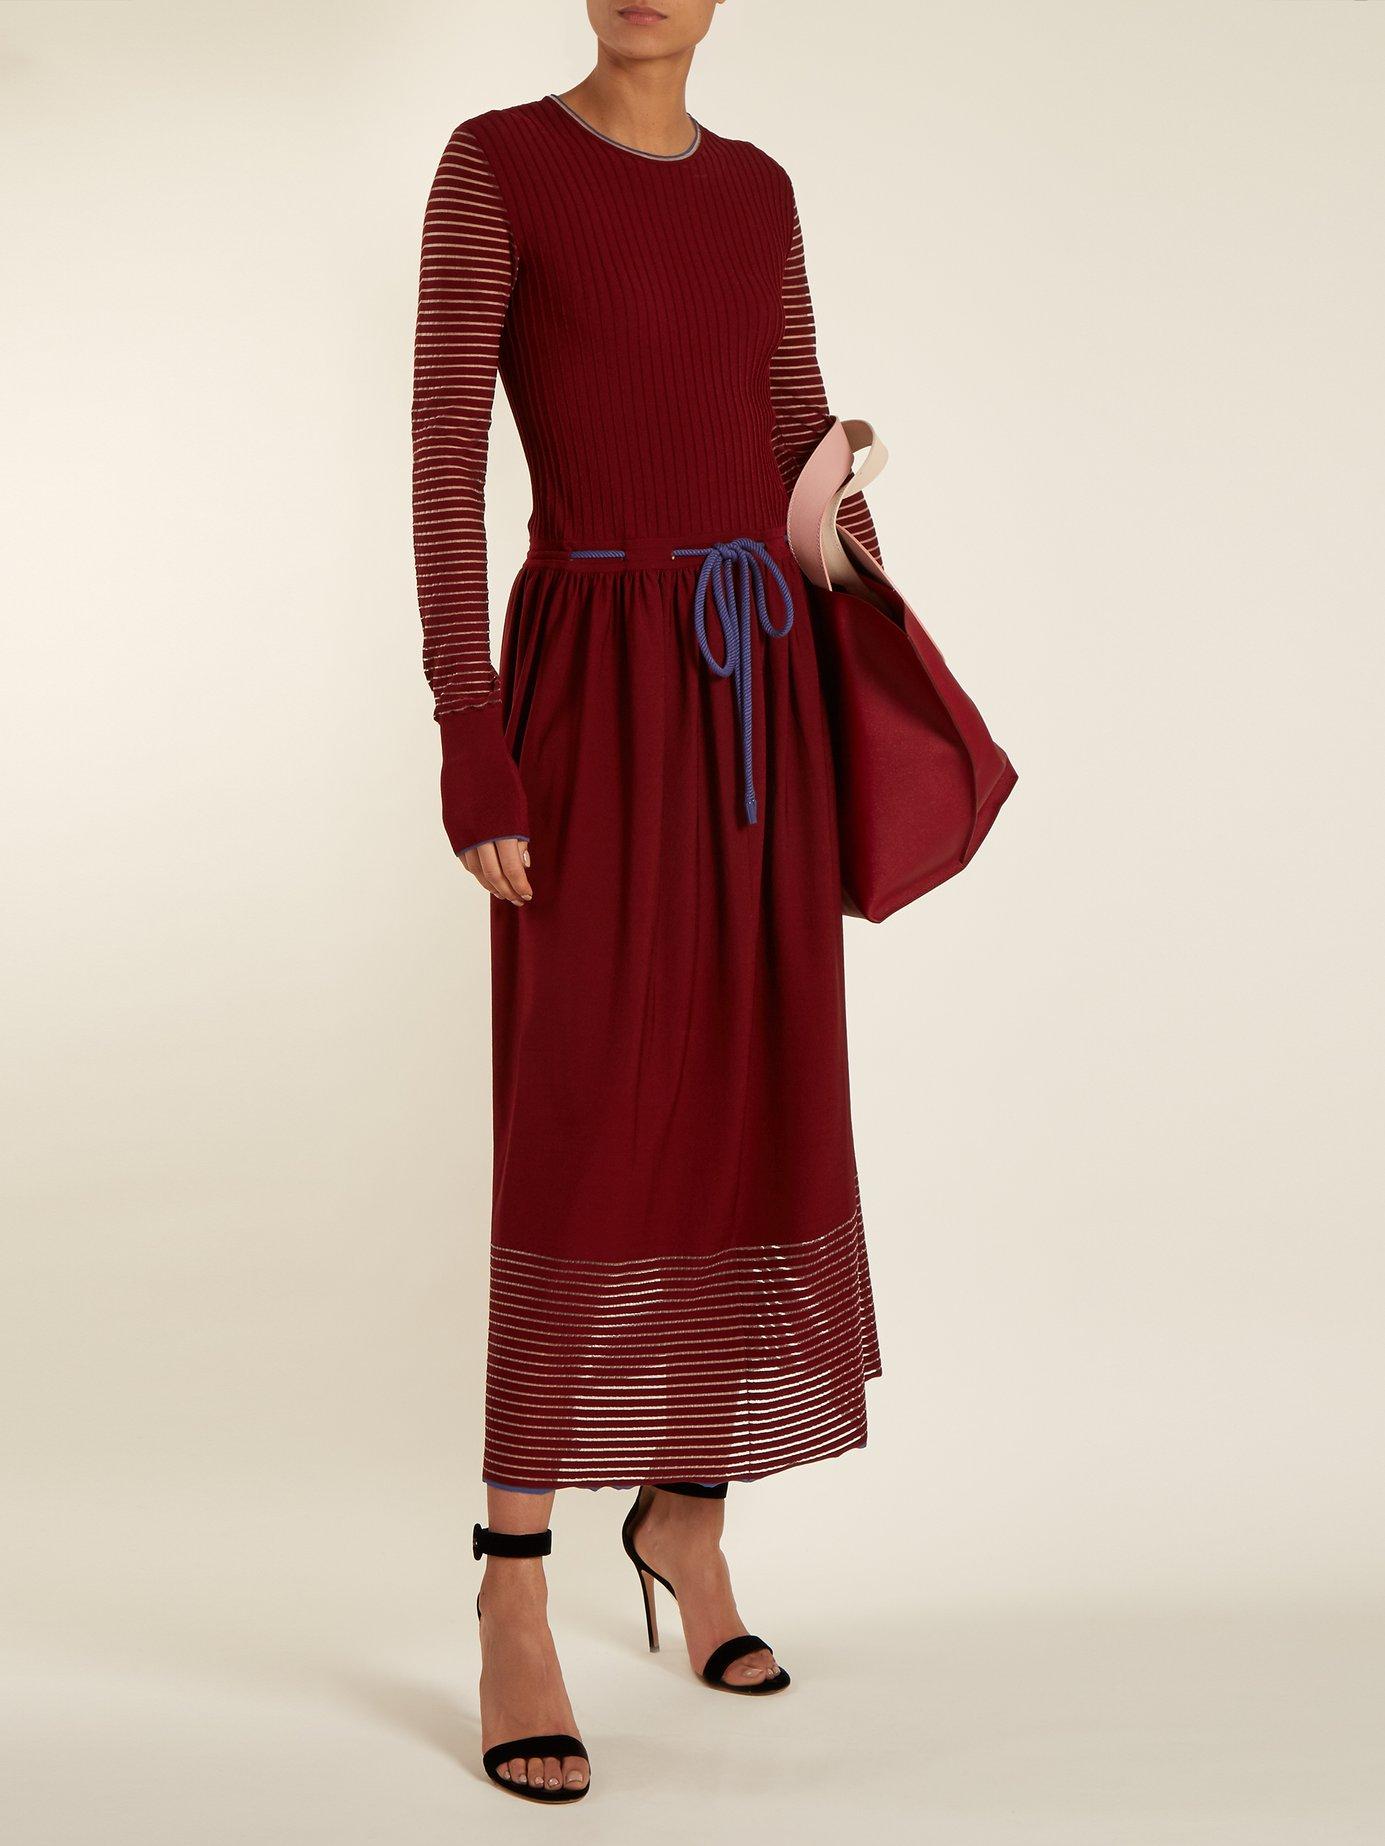 Arago drawstring-detailed dress by Roksanda